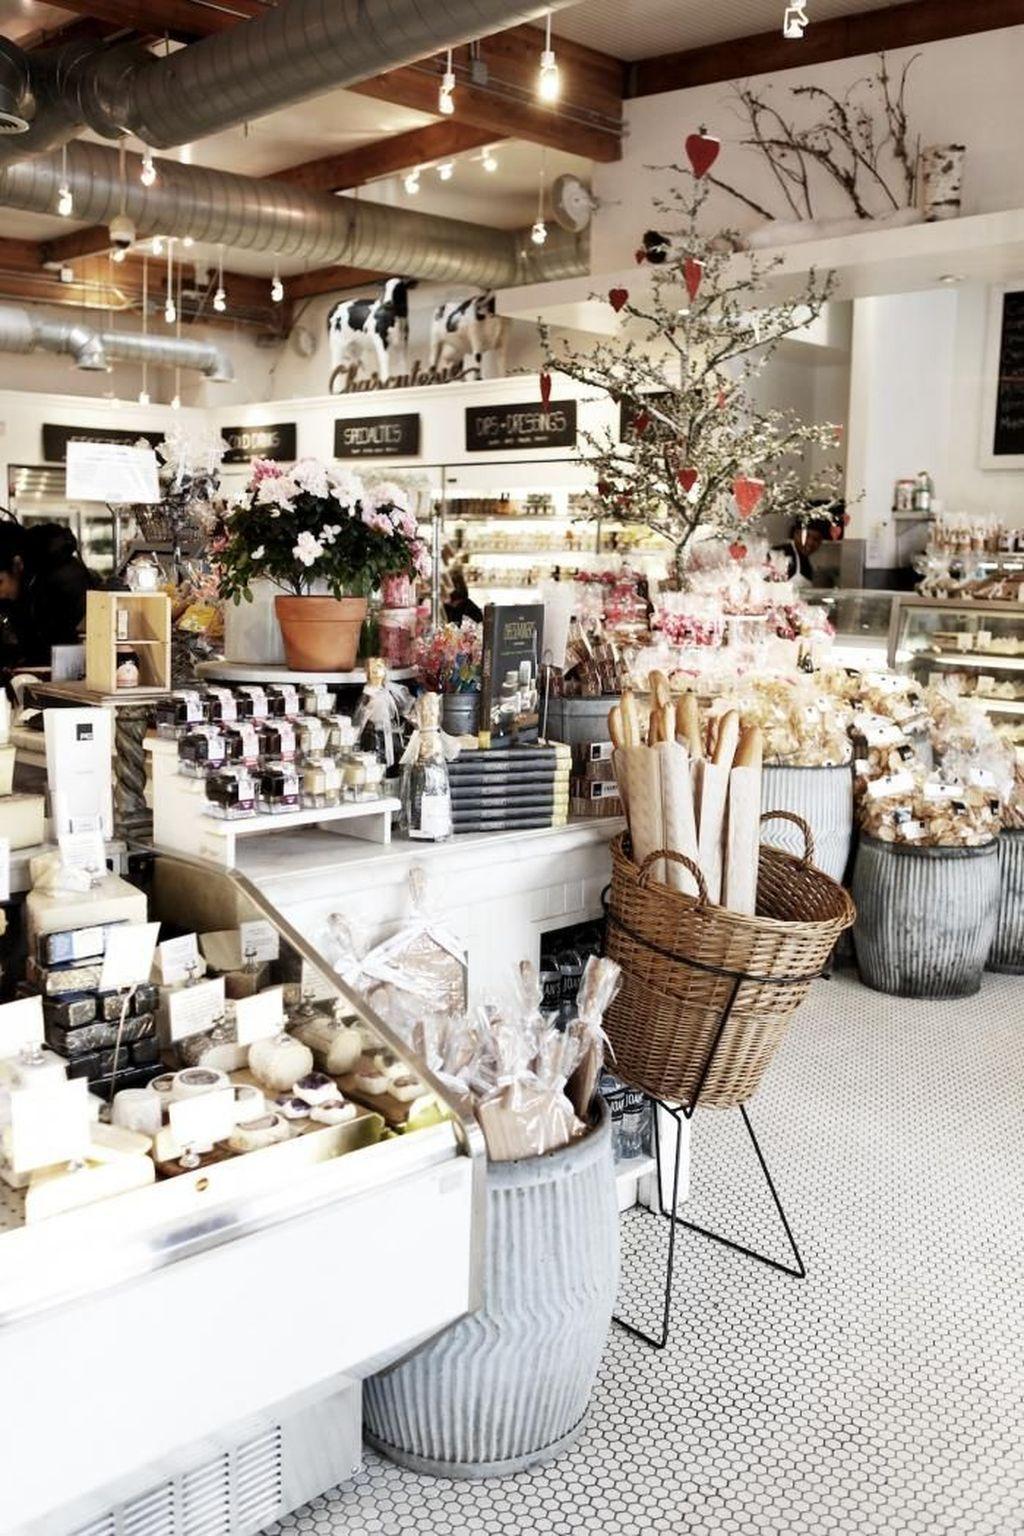 48 retail display ideas 48 crafts and diy rh ar pinterest com